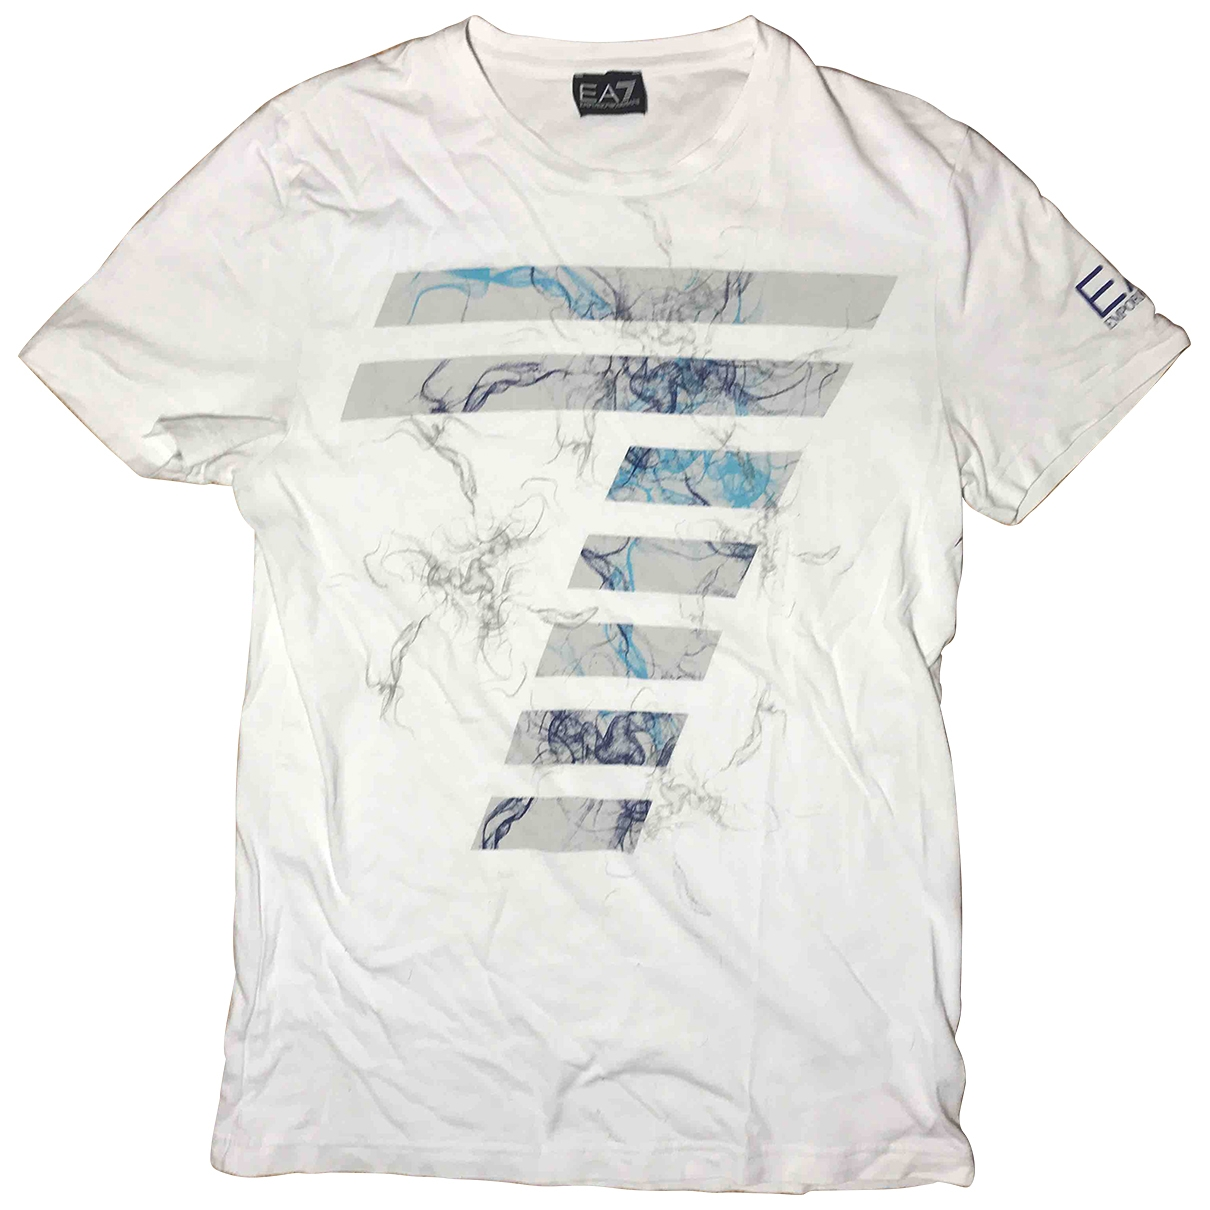 Emporio Armani - Tee shirts   pour homme en coton - blanc